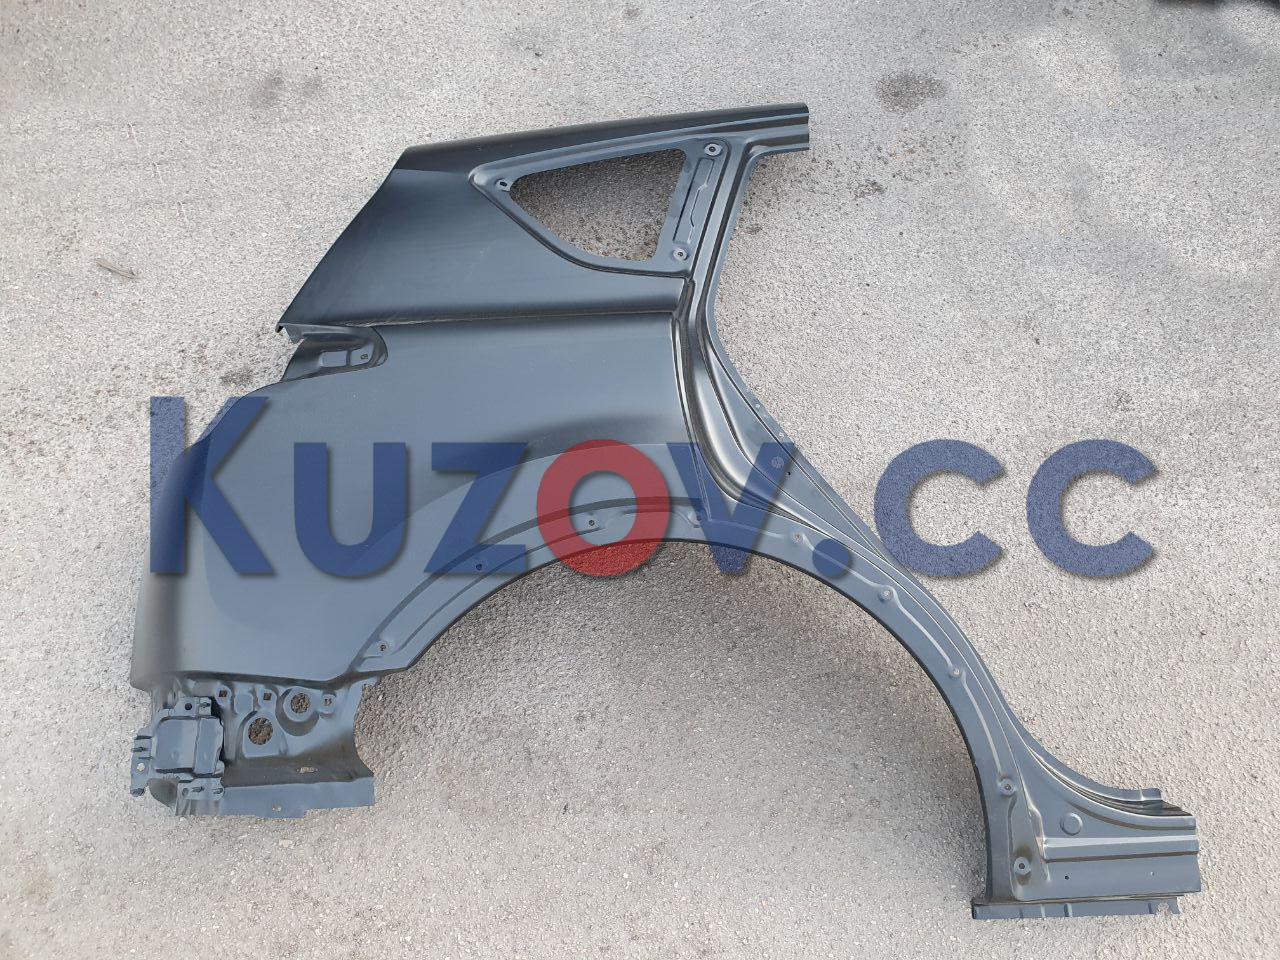 Крыло заднее правое Toyota Rav4 '13-18 (FPS) 616010R110